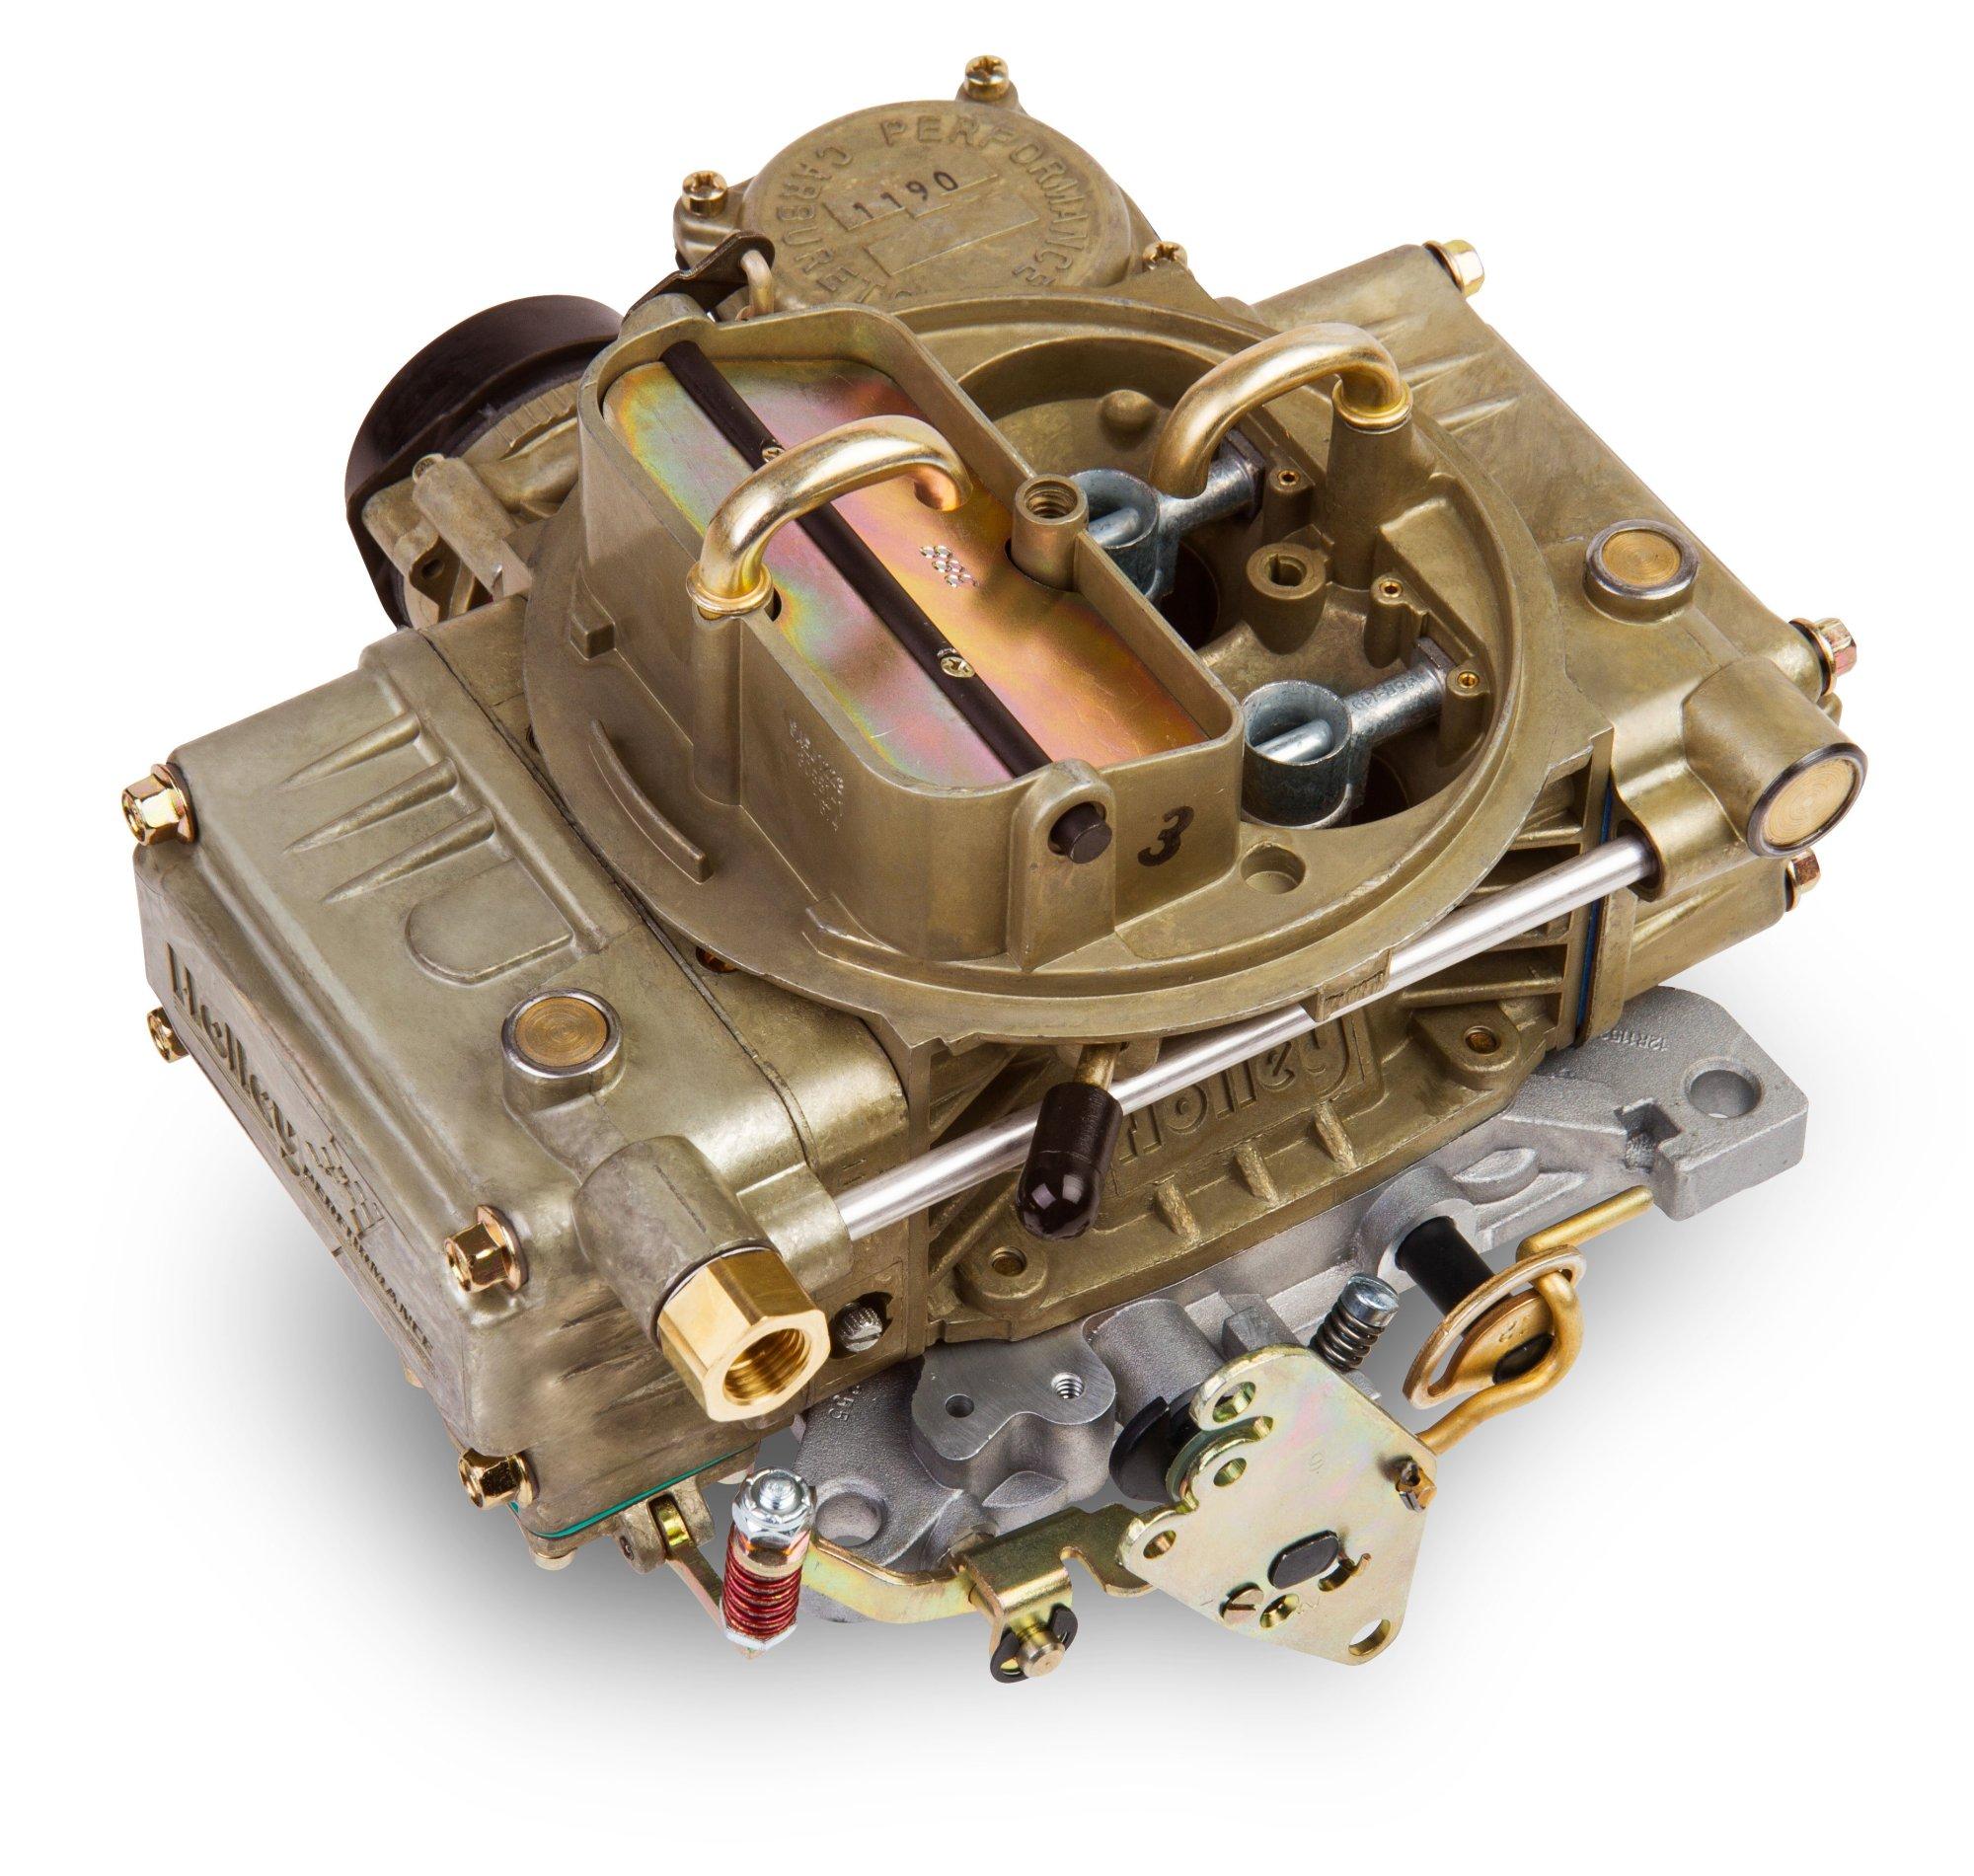 hight resolution of 0 80551 600 cfm marine carburetor image